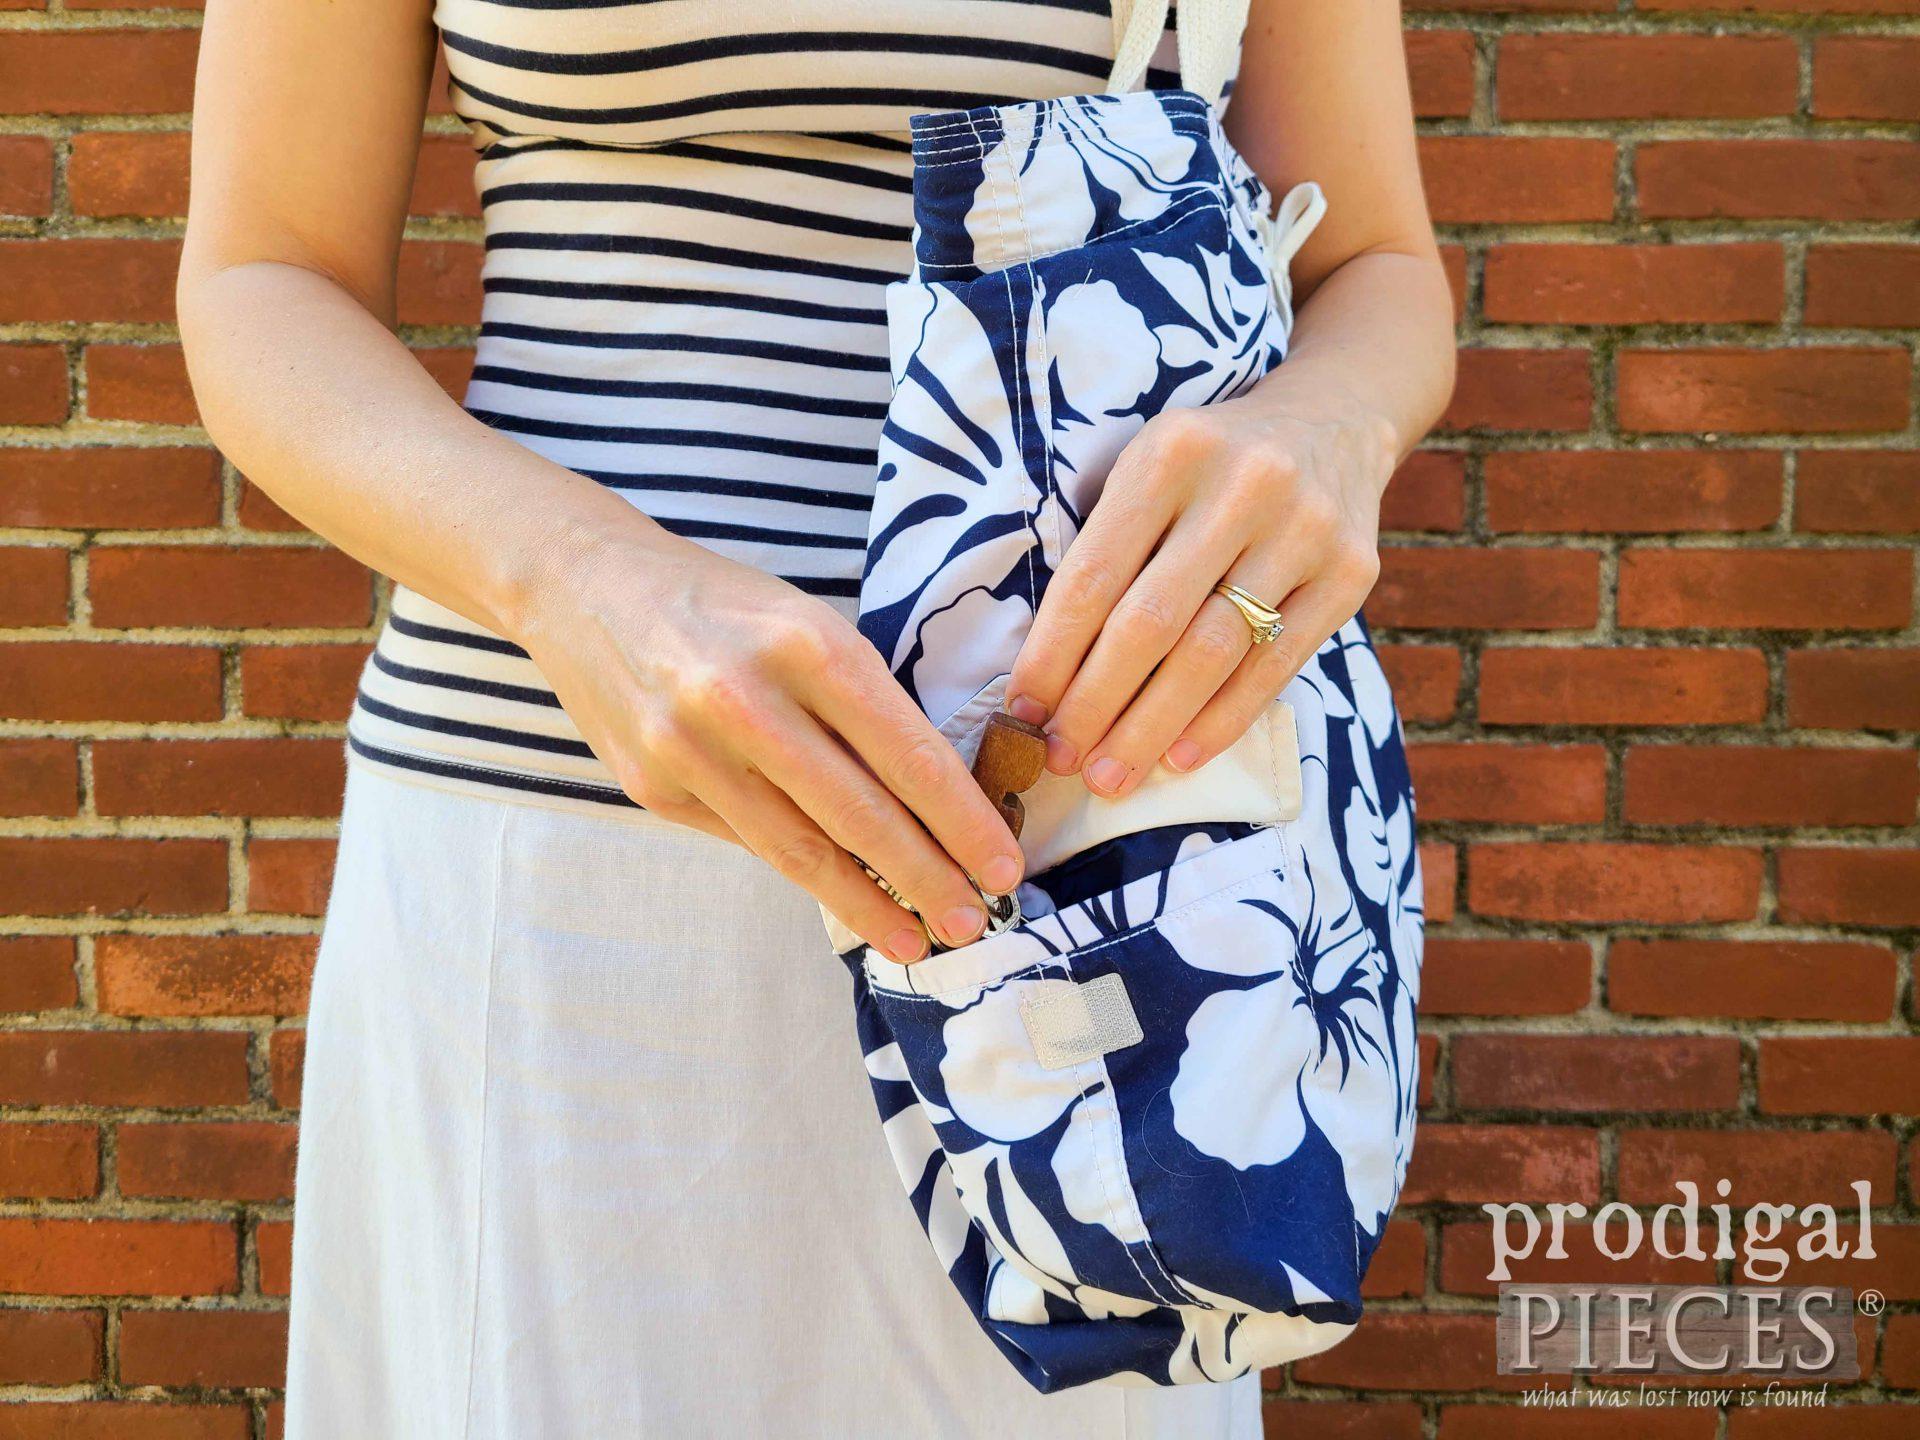 Upcycled Swimsuit Bag Pocket by Larissa of Prodigal Pieces   prodigalpieces.com #prodigalpieces #sewing #fashion #diy #summer #bag